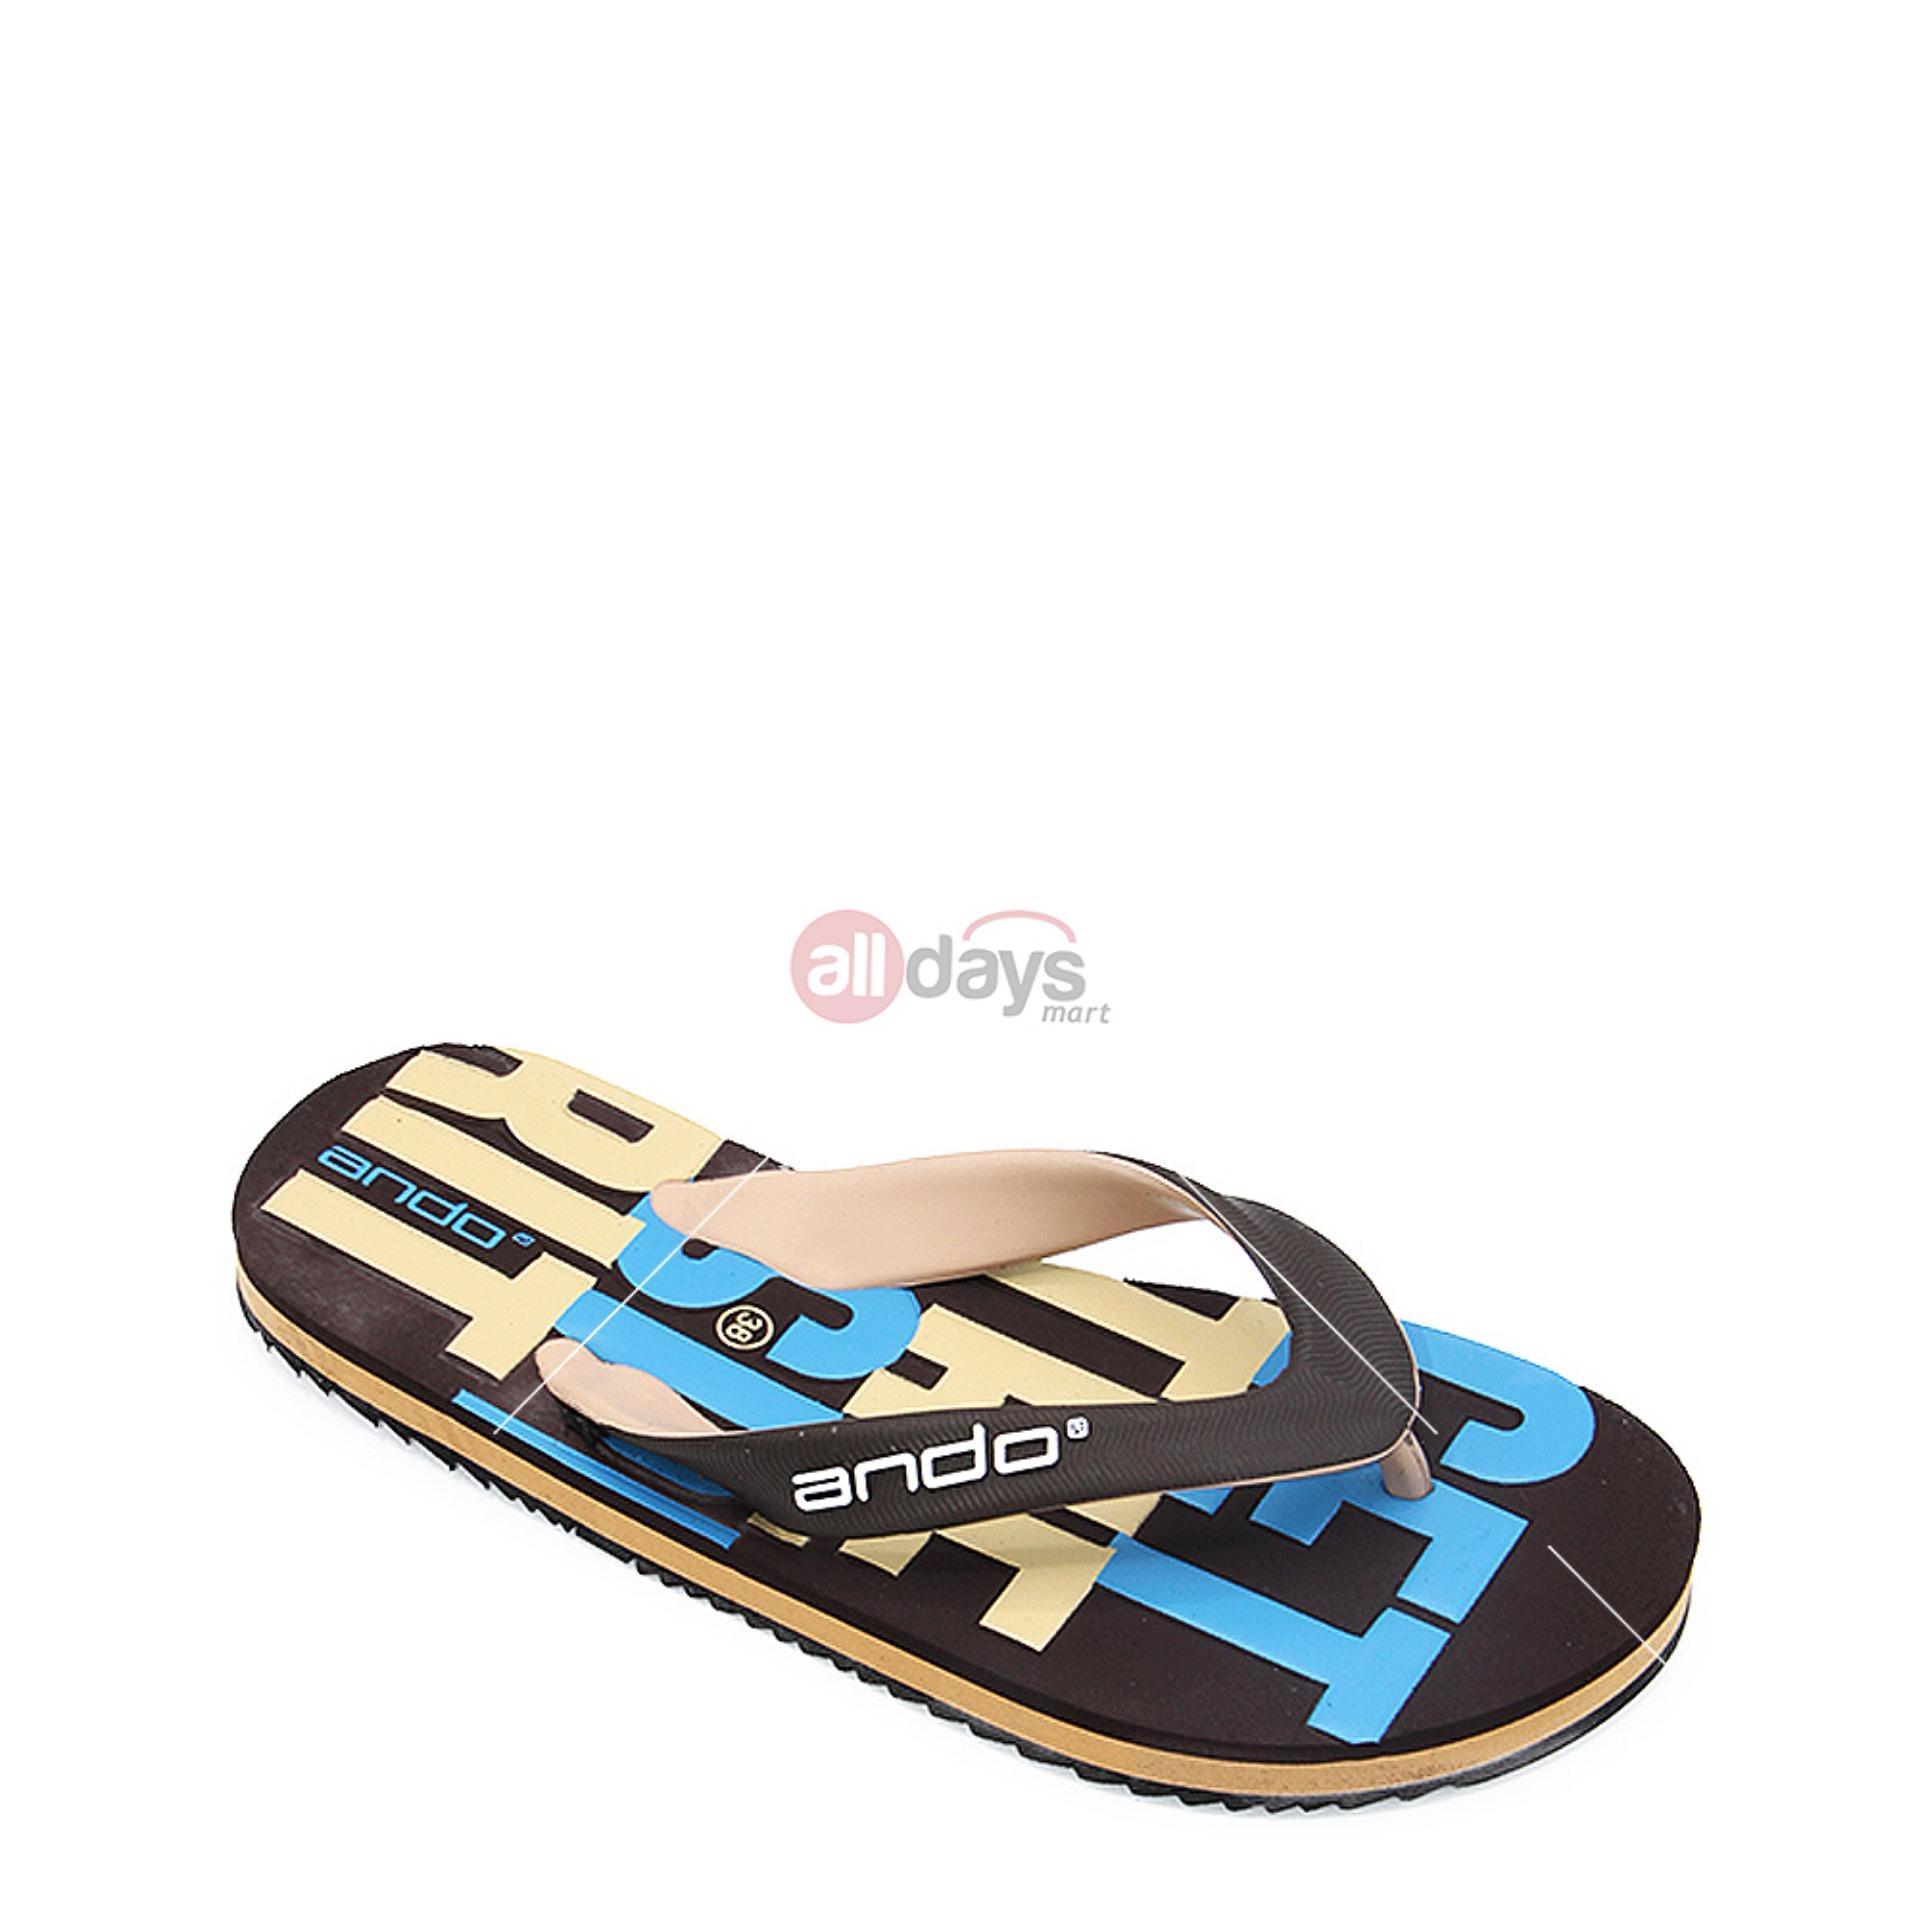 Toko Ando Sandal Jepit Pria Grafitty 02 Coklat Tan Size 38 42 Online Terpercaya